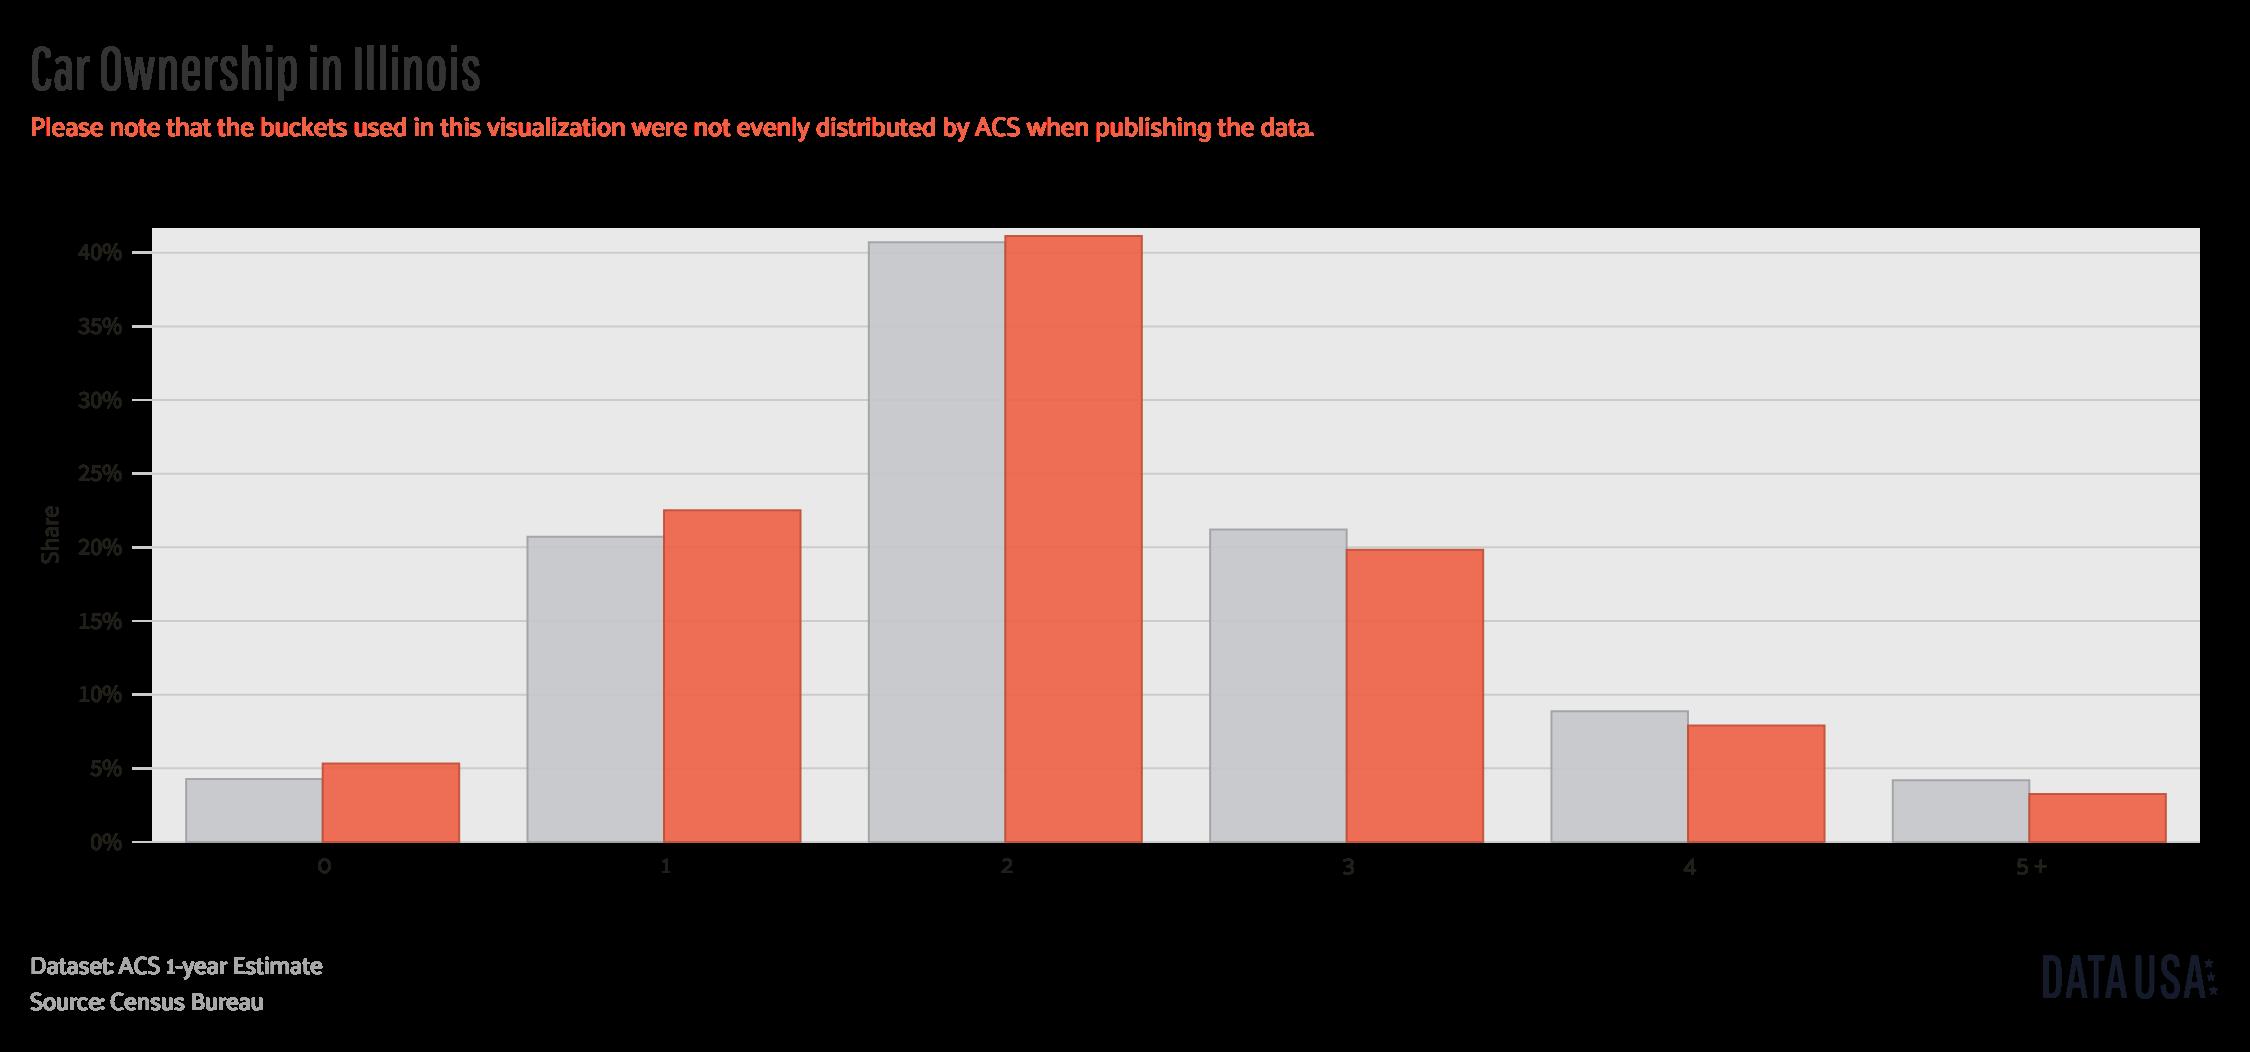 Illinois Car Ownership Statistics